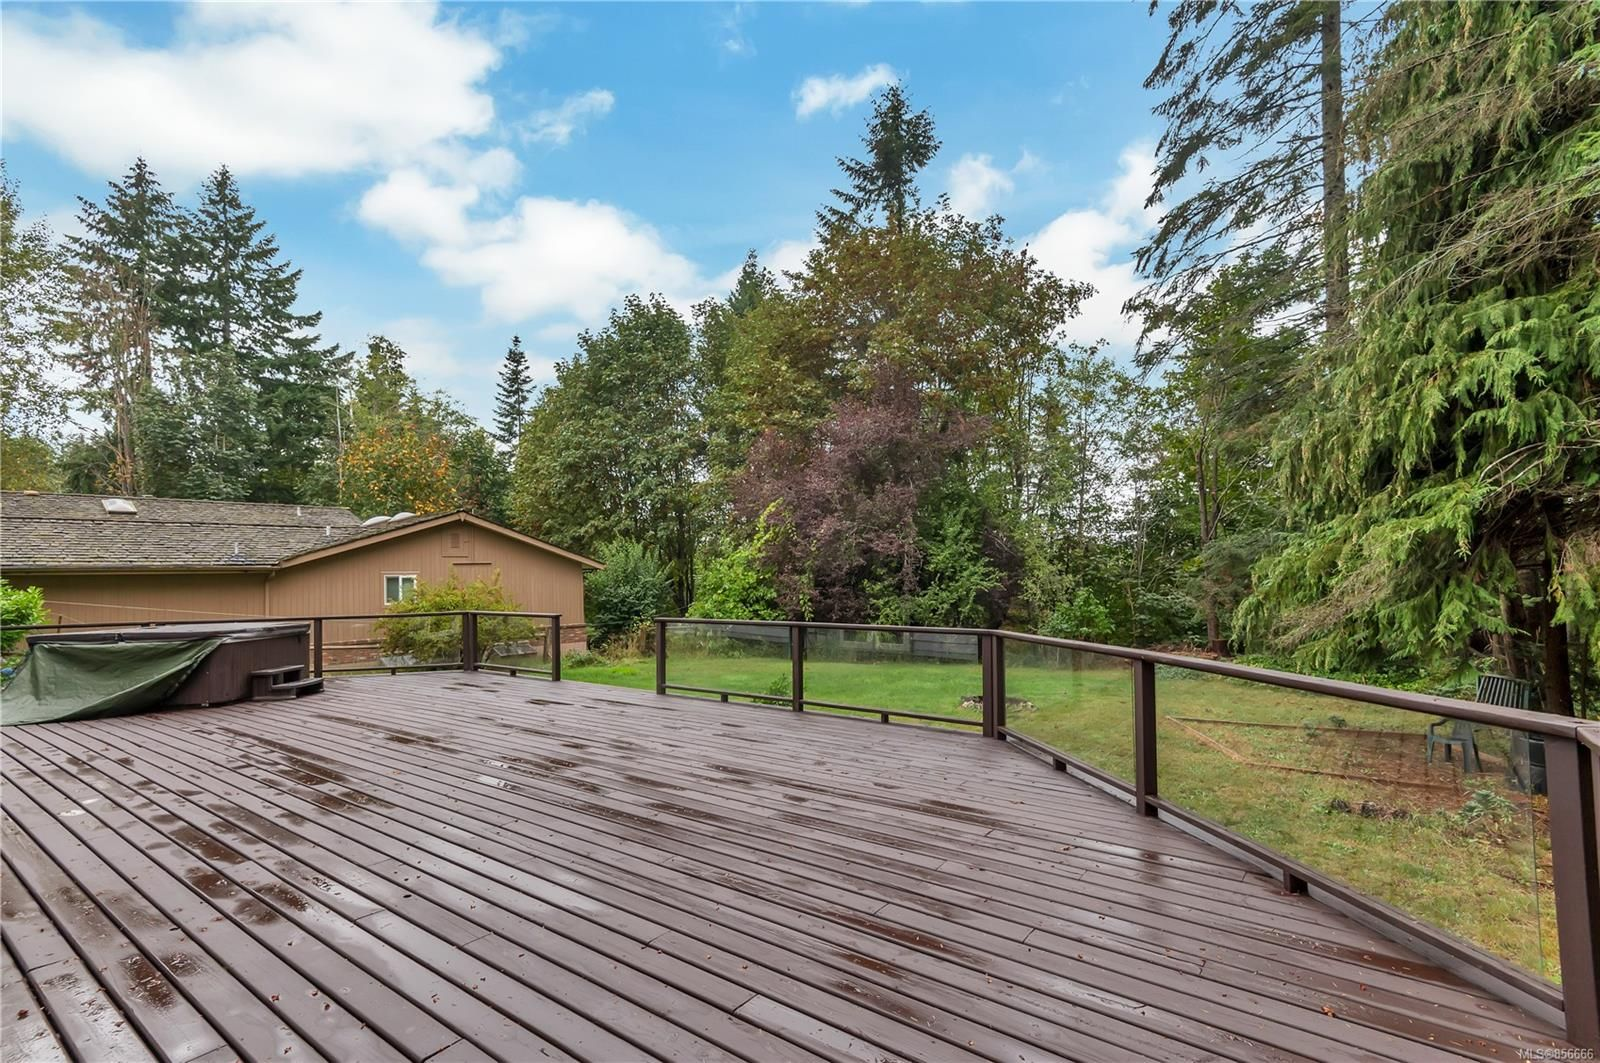 Photo 39: Photos: 2468 Oakes Rd in : CV Merville Black Creek House for sale (Comox Valley)  : MLS®# 856666